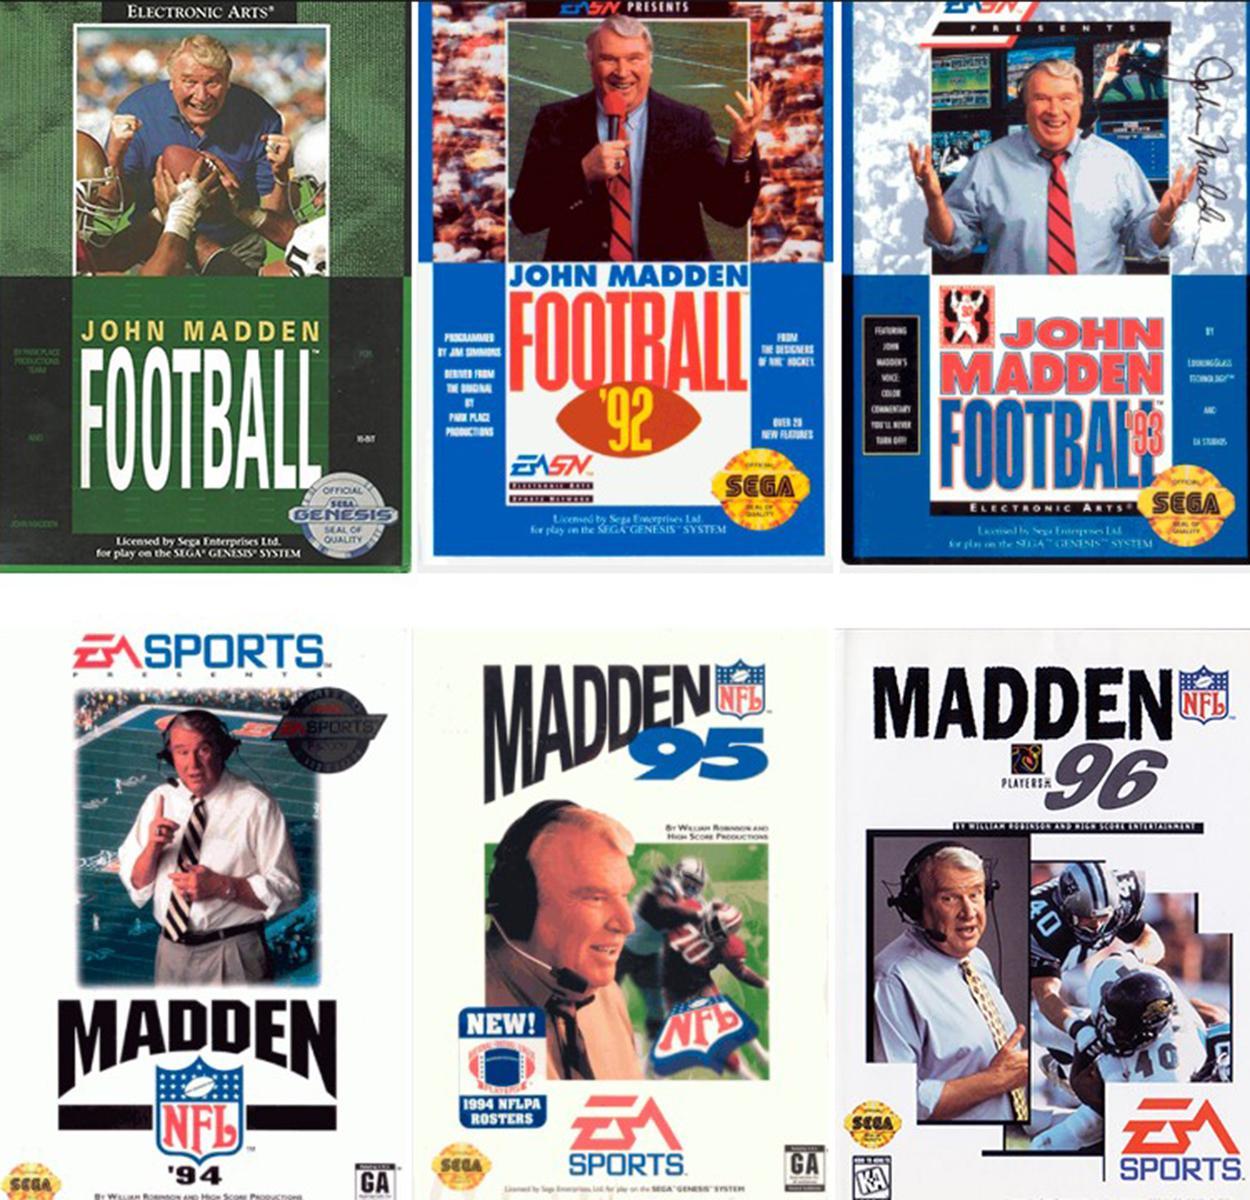 Capas do Madden nos anos 1990